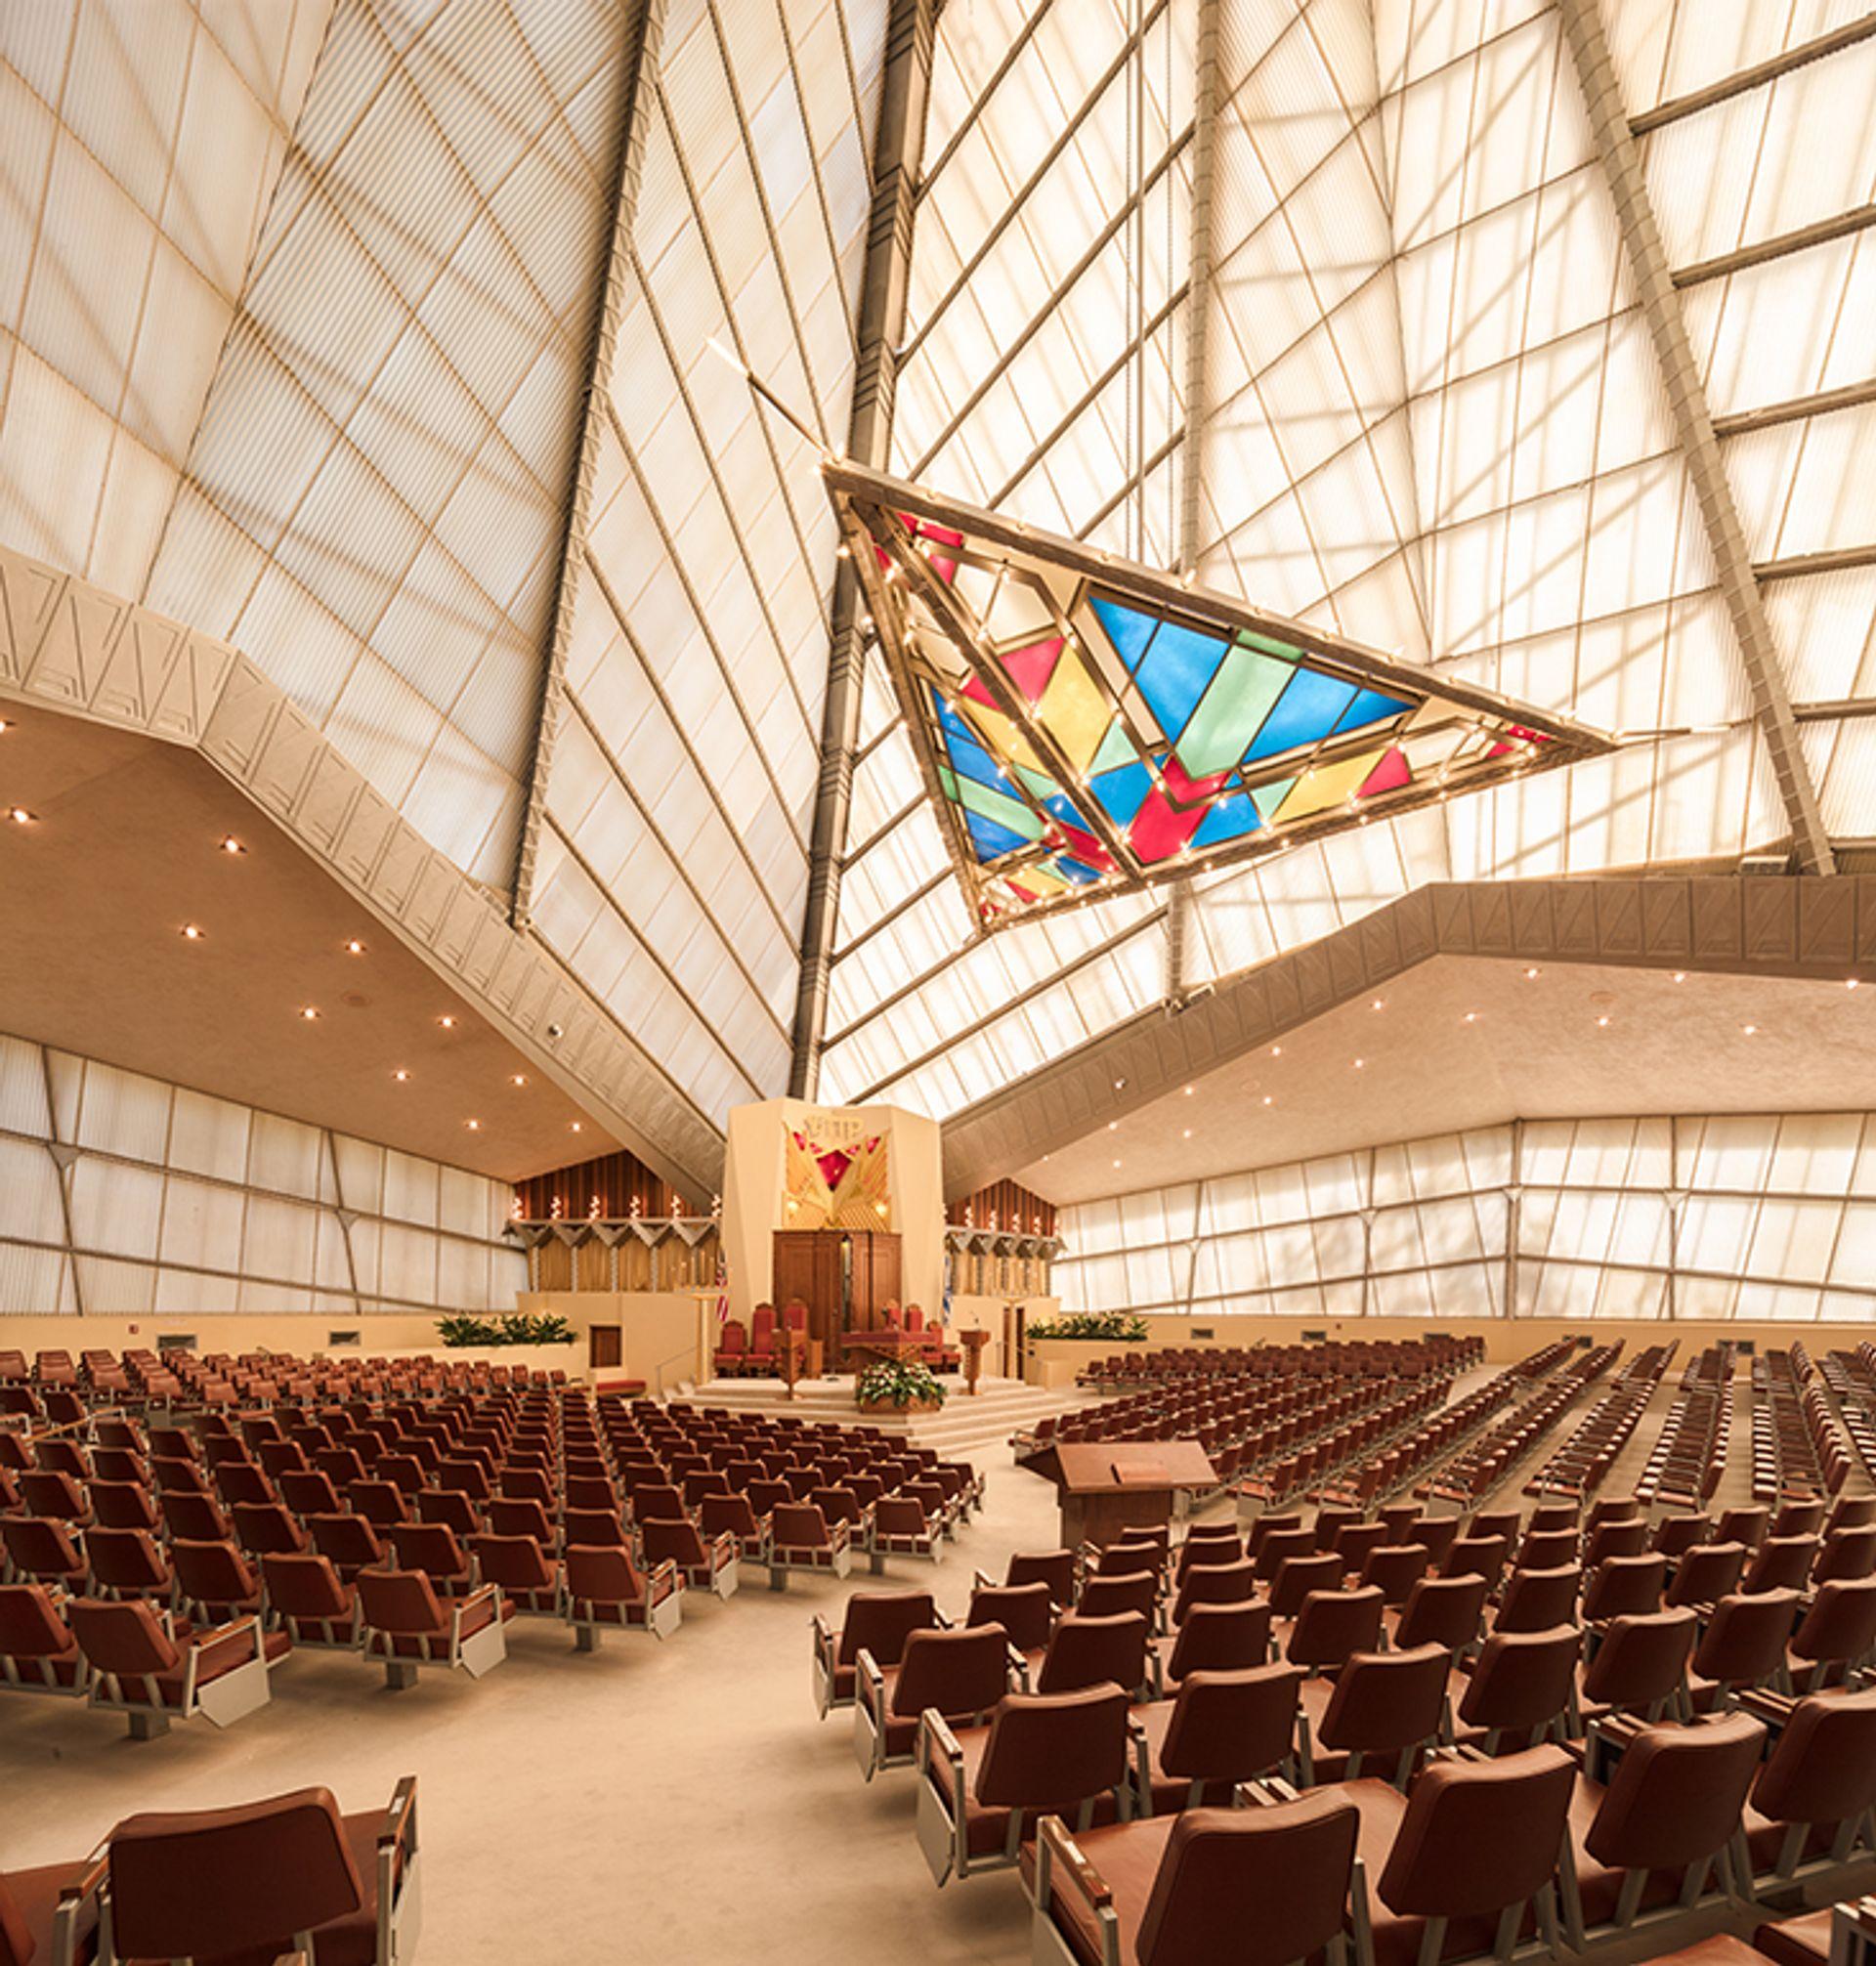 The interior of Beth Sholom Synagogue in Elkins Park, Pennsylvania ©2013 Darren Bradley